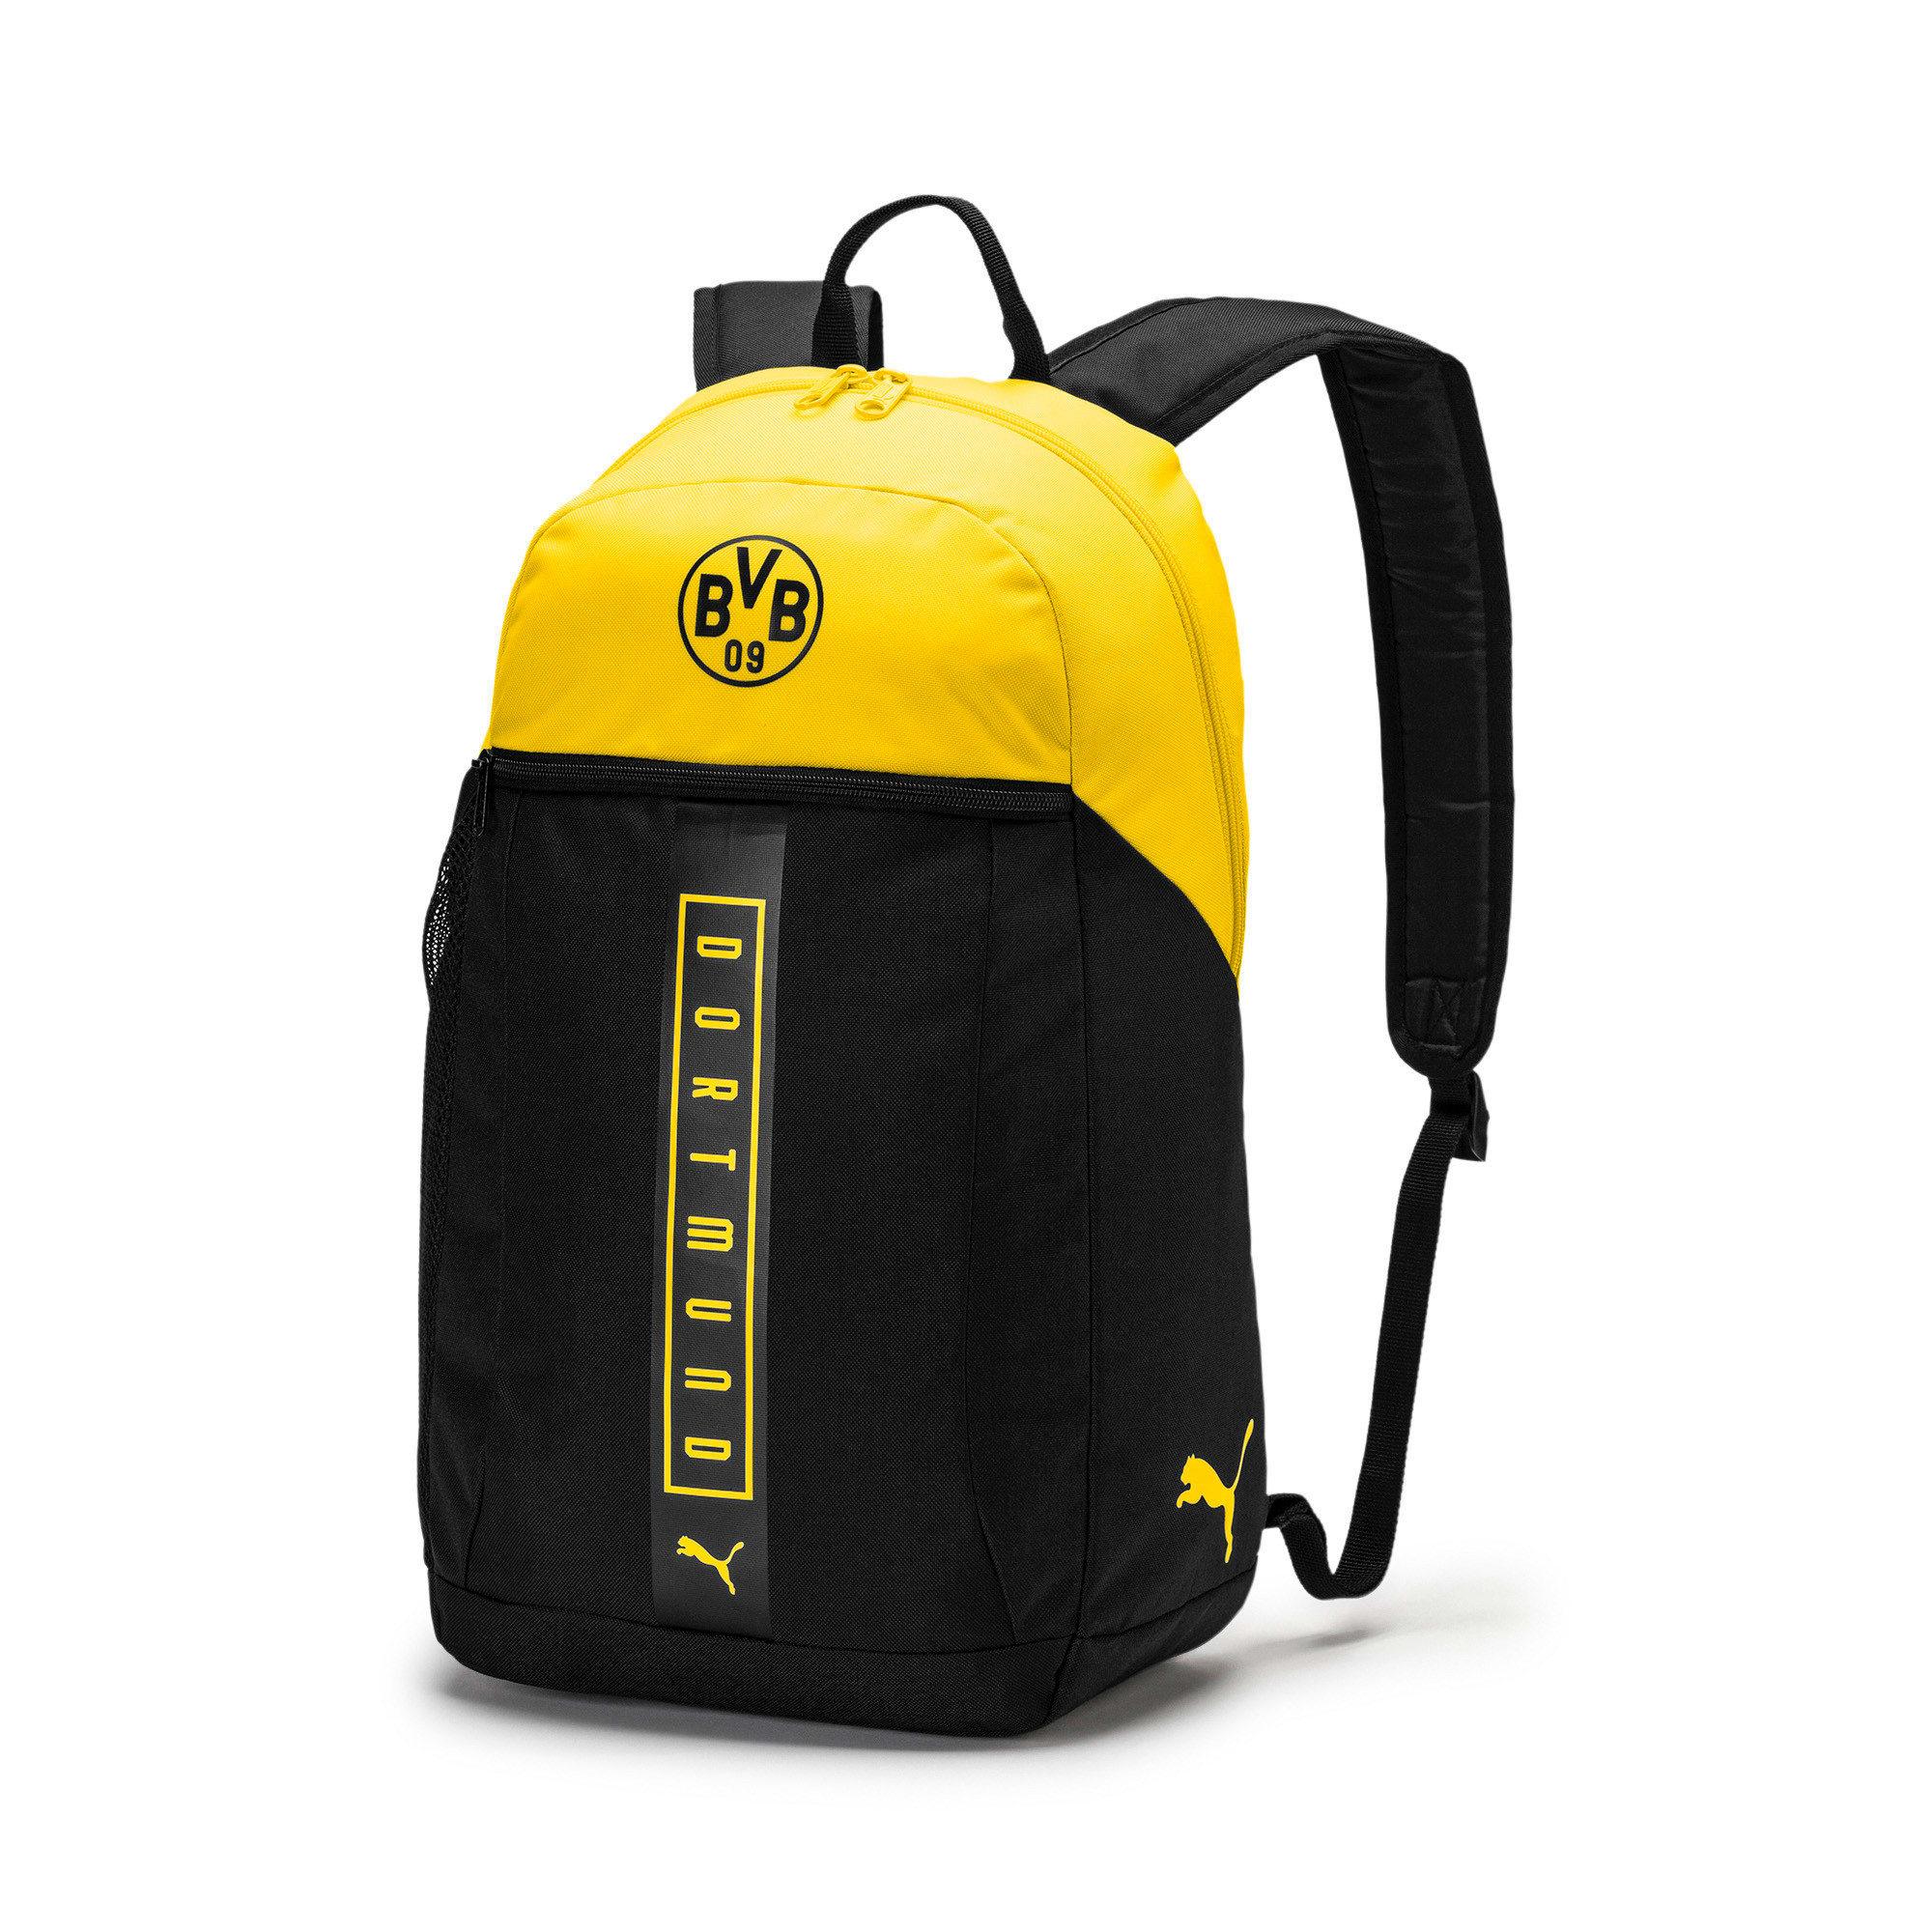 Thumbnail 1 of BVB Fan Backpack, Puma Black-Cyber Yellow, medium